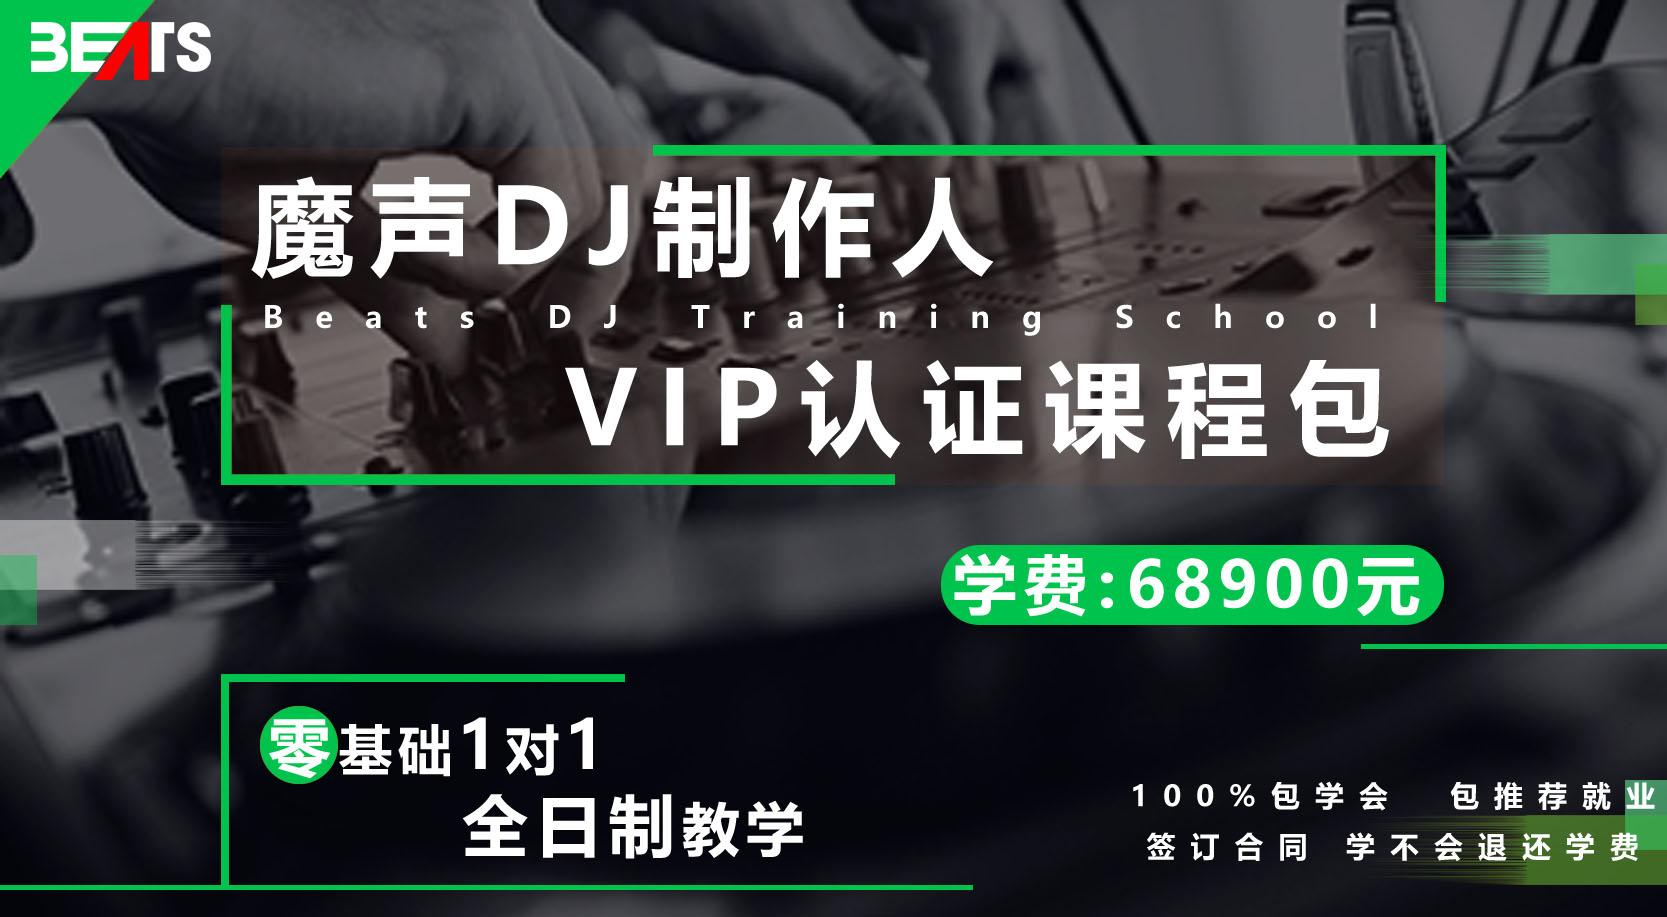 BEATS DJ厂牌  电子音乐制作人终极认证课程包